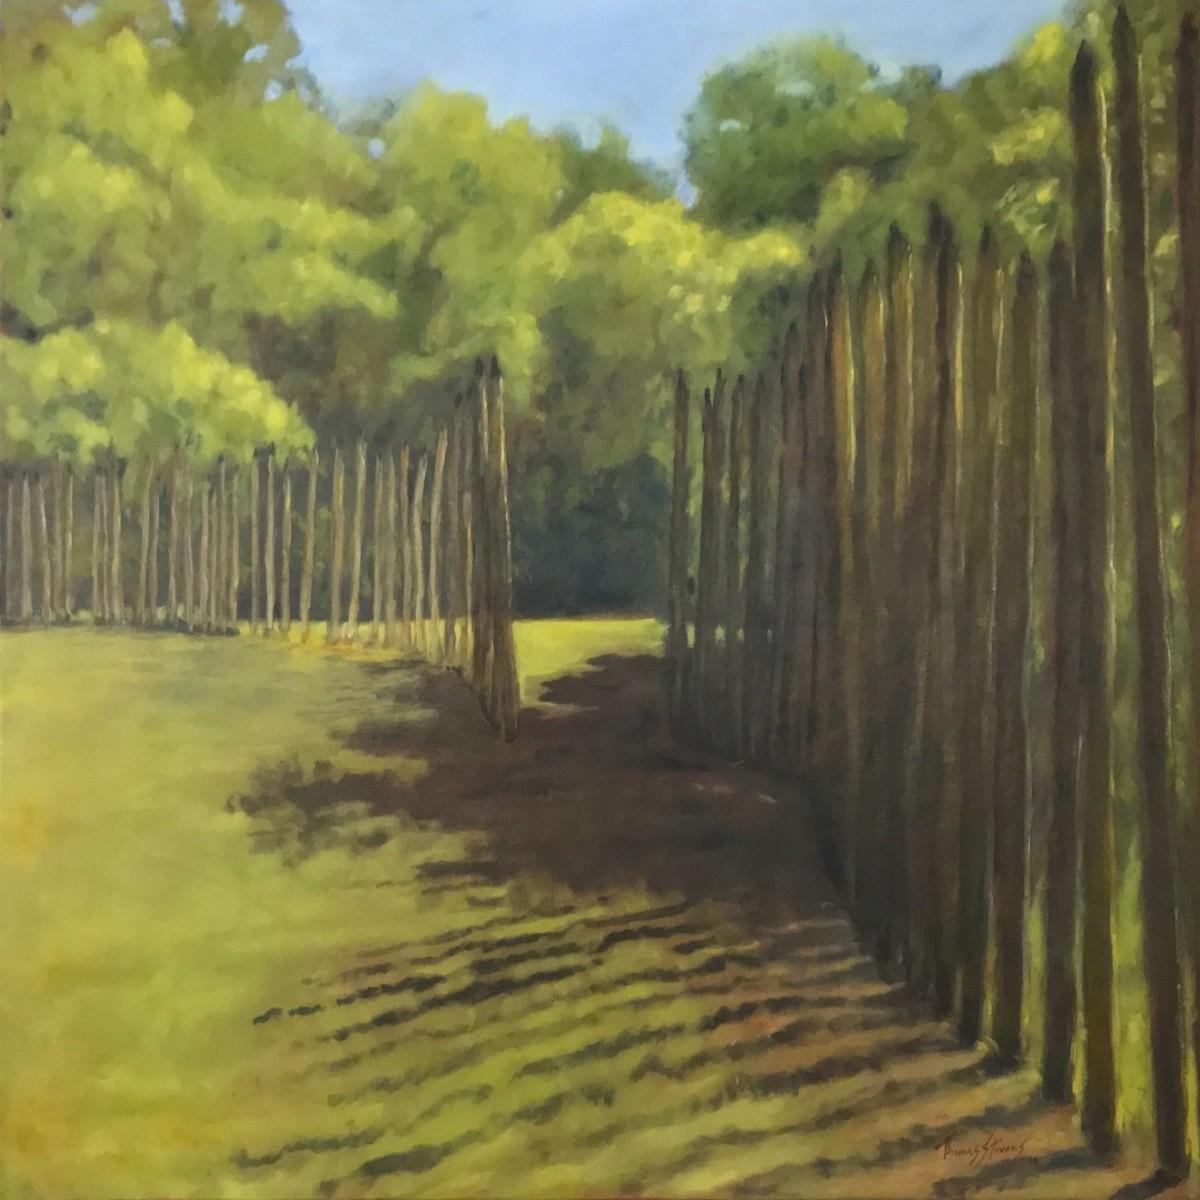 Shadow Gate   (Occaneechi series - 36.07242N 79.097786W) by Thomas Stevens